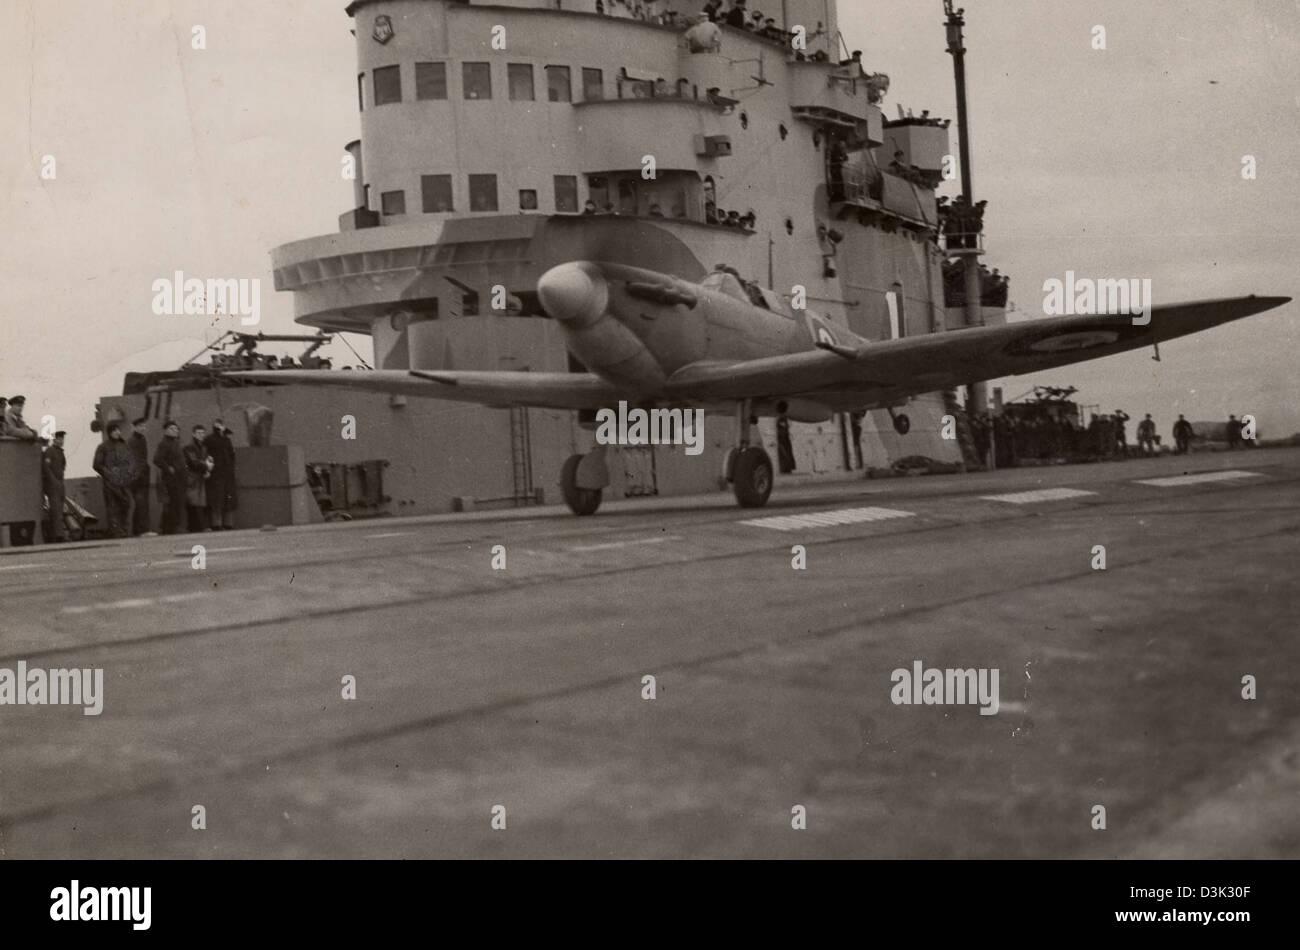 Royal Navy Seafire of WW11 - Stock Image